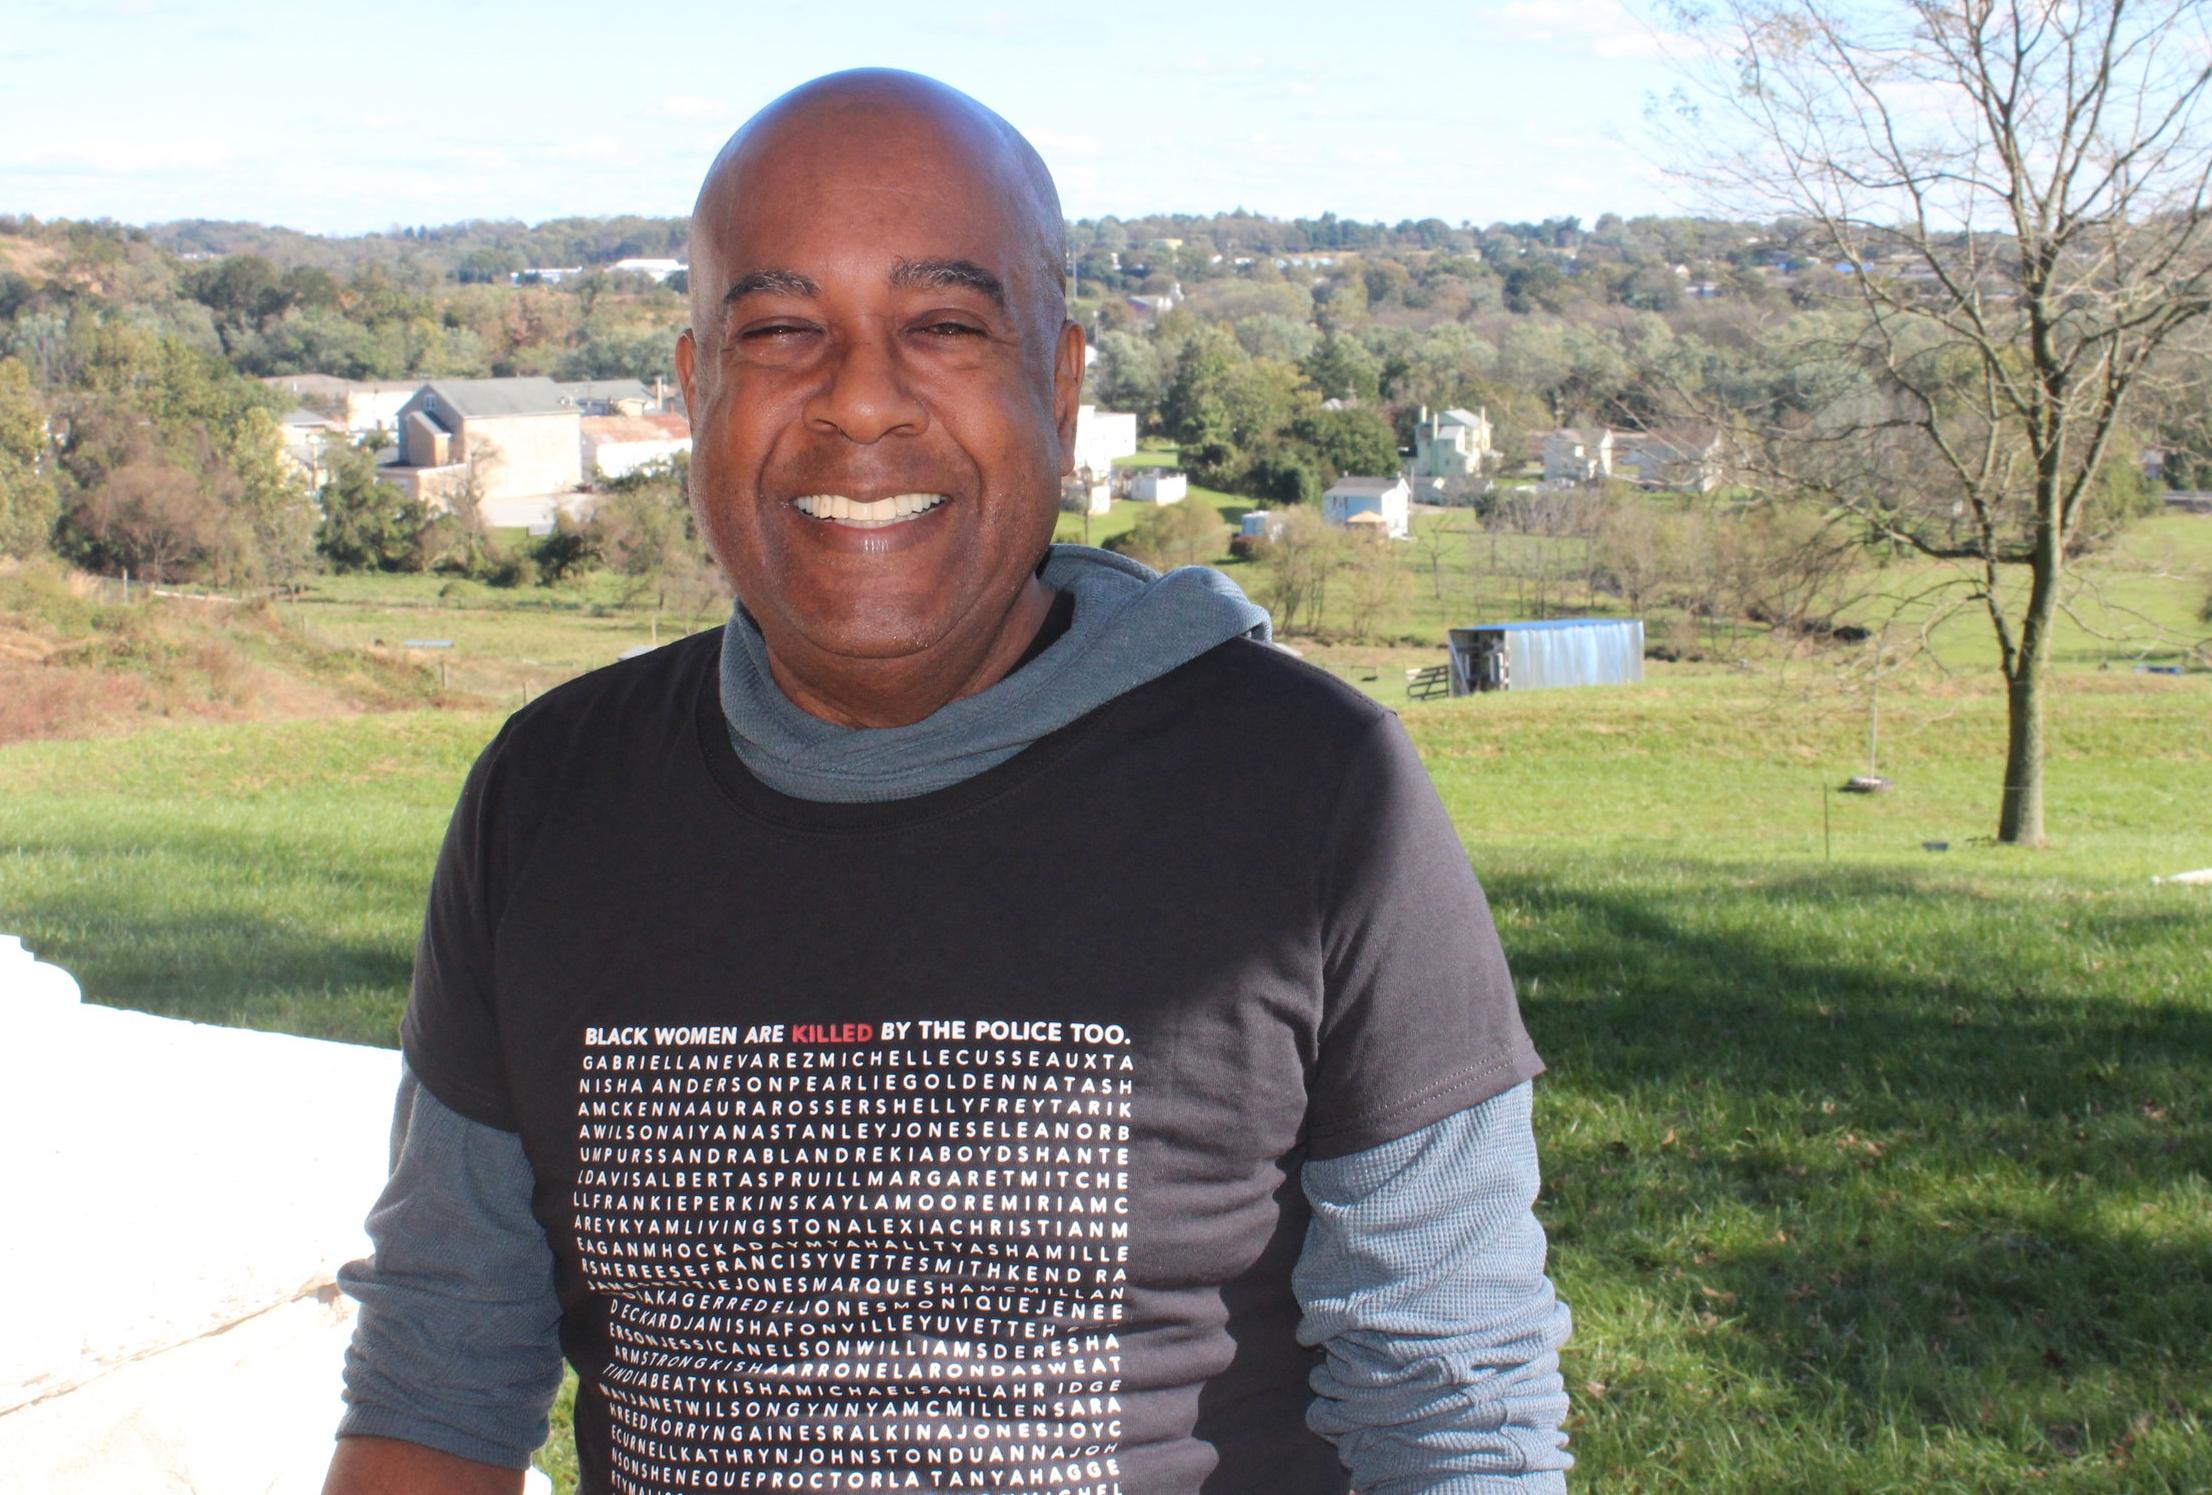 Luke Charles Harris Founder & Director of Programming info@aapf.org